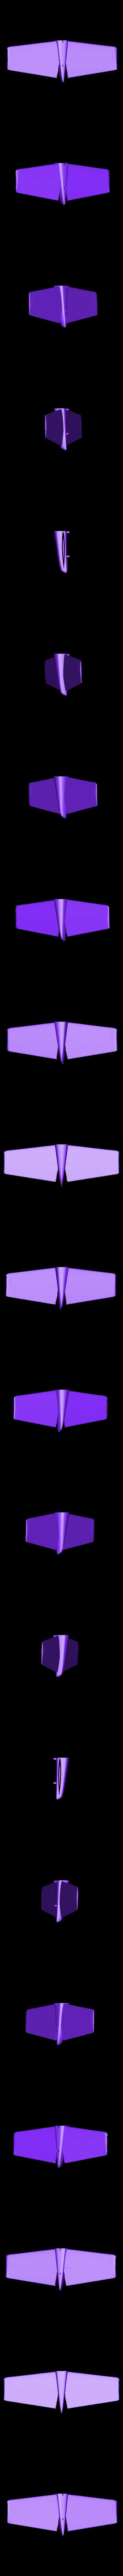 Cone.stl Download STL file Cessna 210 • Model to 3D print, Eduardohbm